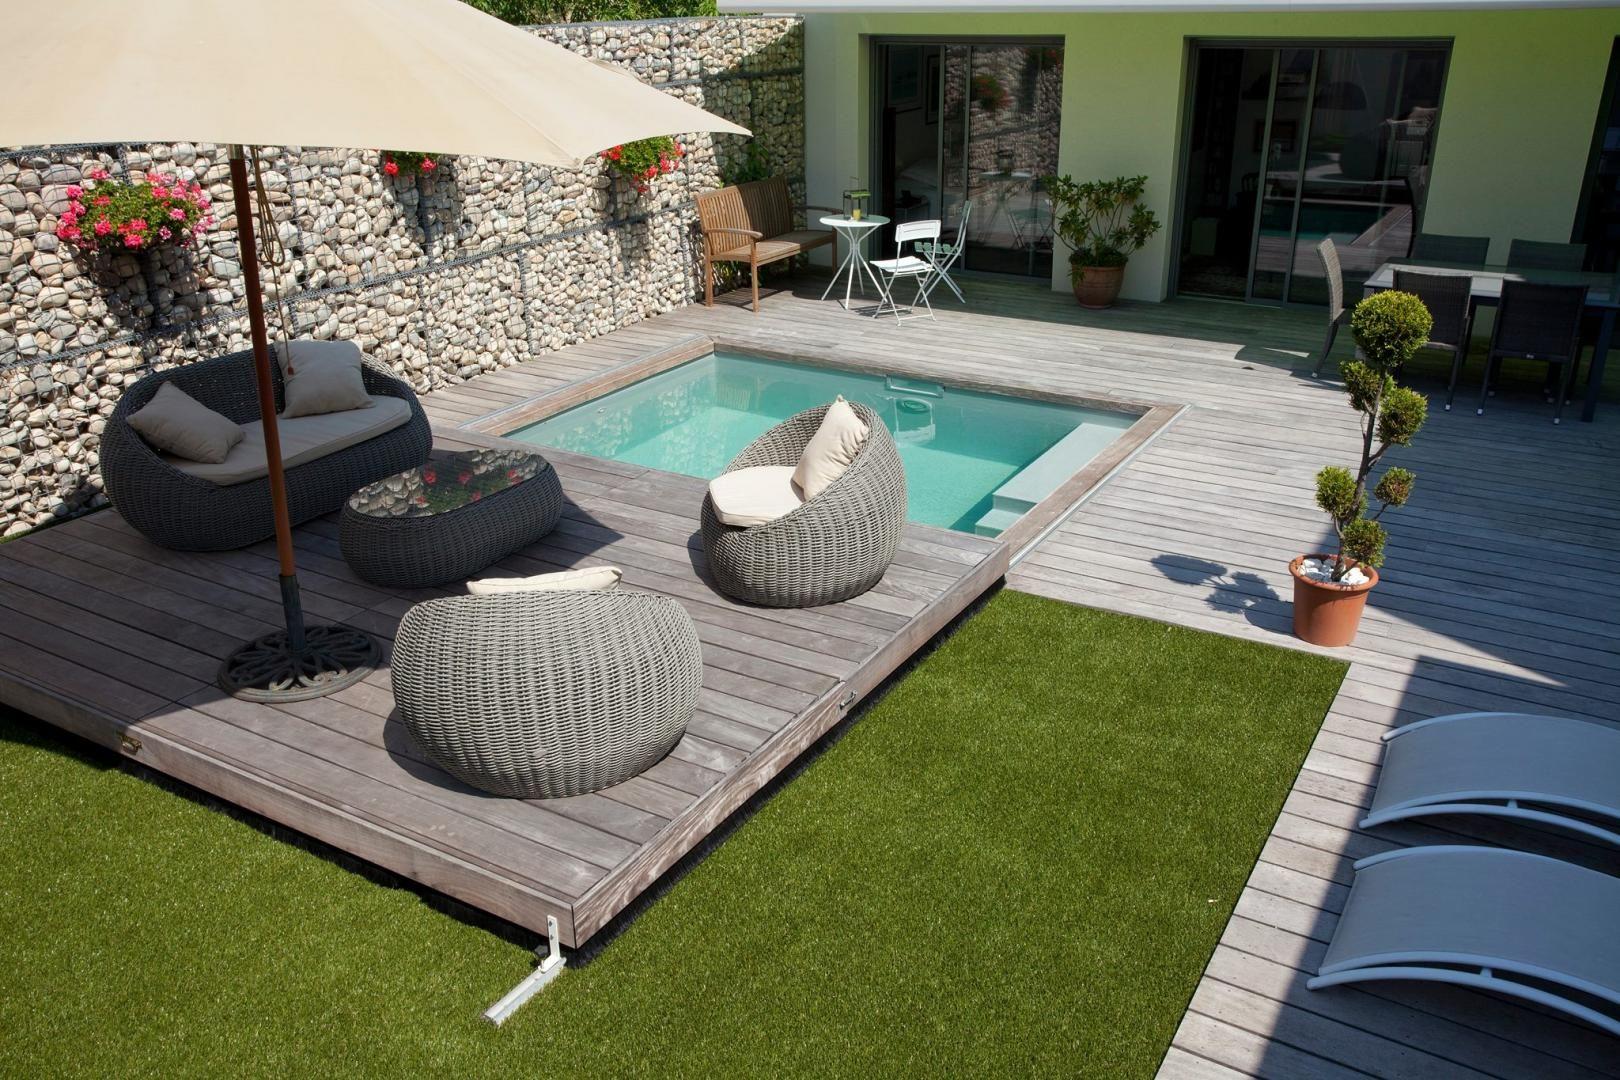 terrasse mobile pour piscine jardin plantes id es. Black Bedroom Furniture Sets. Home Design Ideas